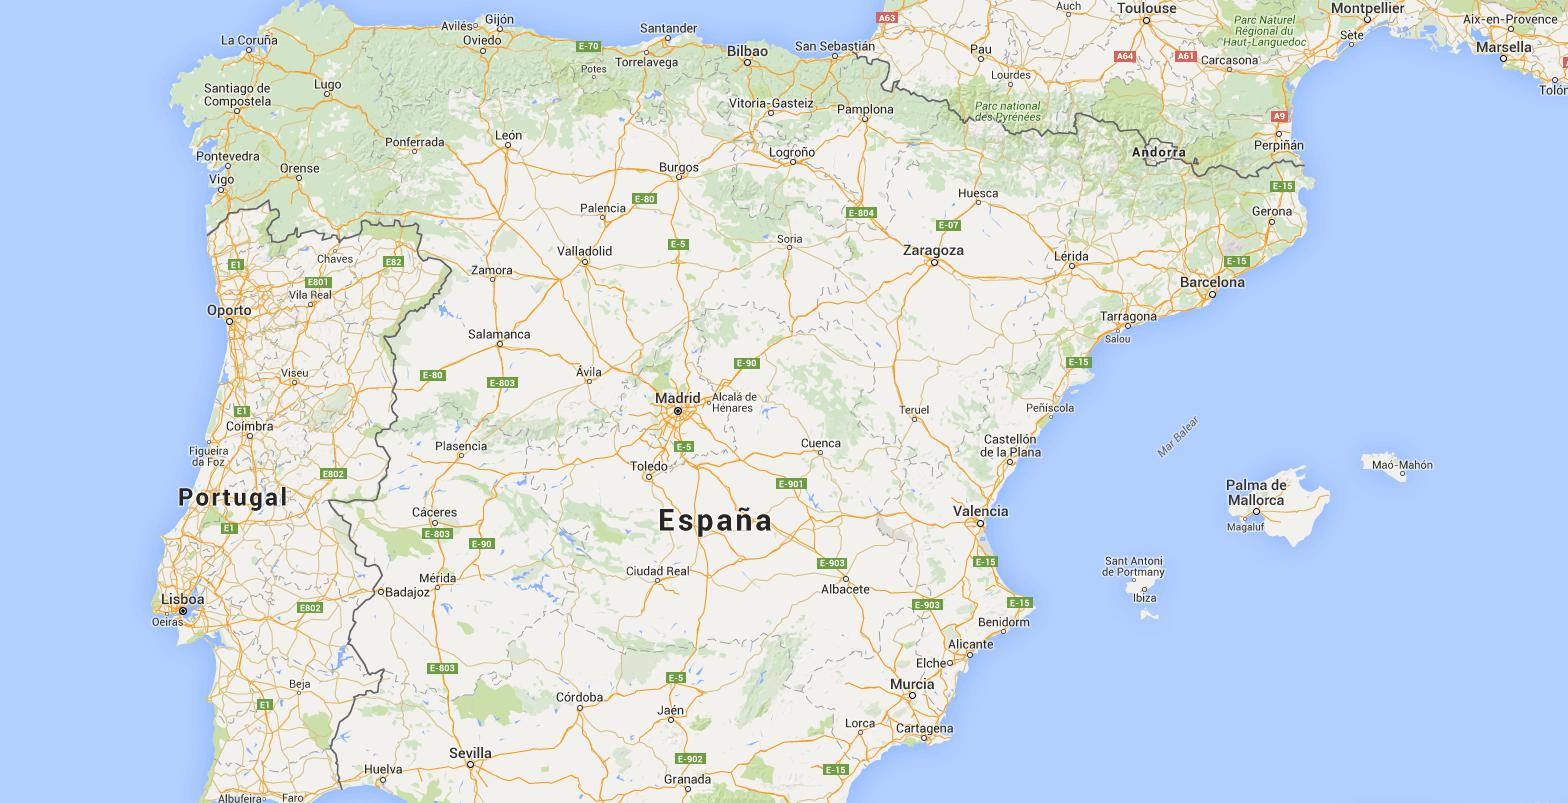 Merge of Datos paro 2t 2015 and Provincias España Peninsular y Baleares - Google Fusion Tables